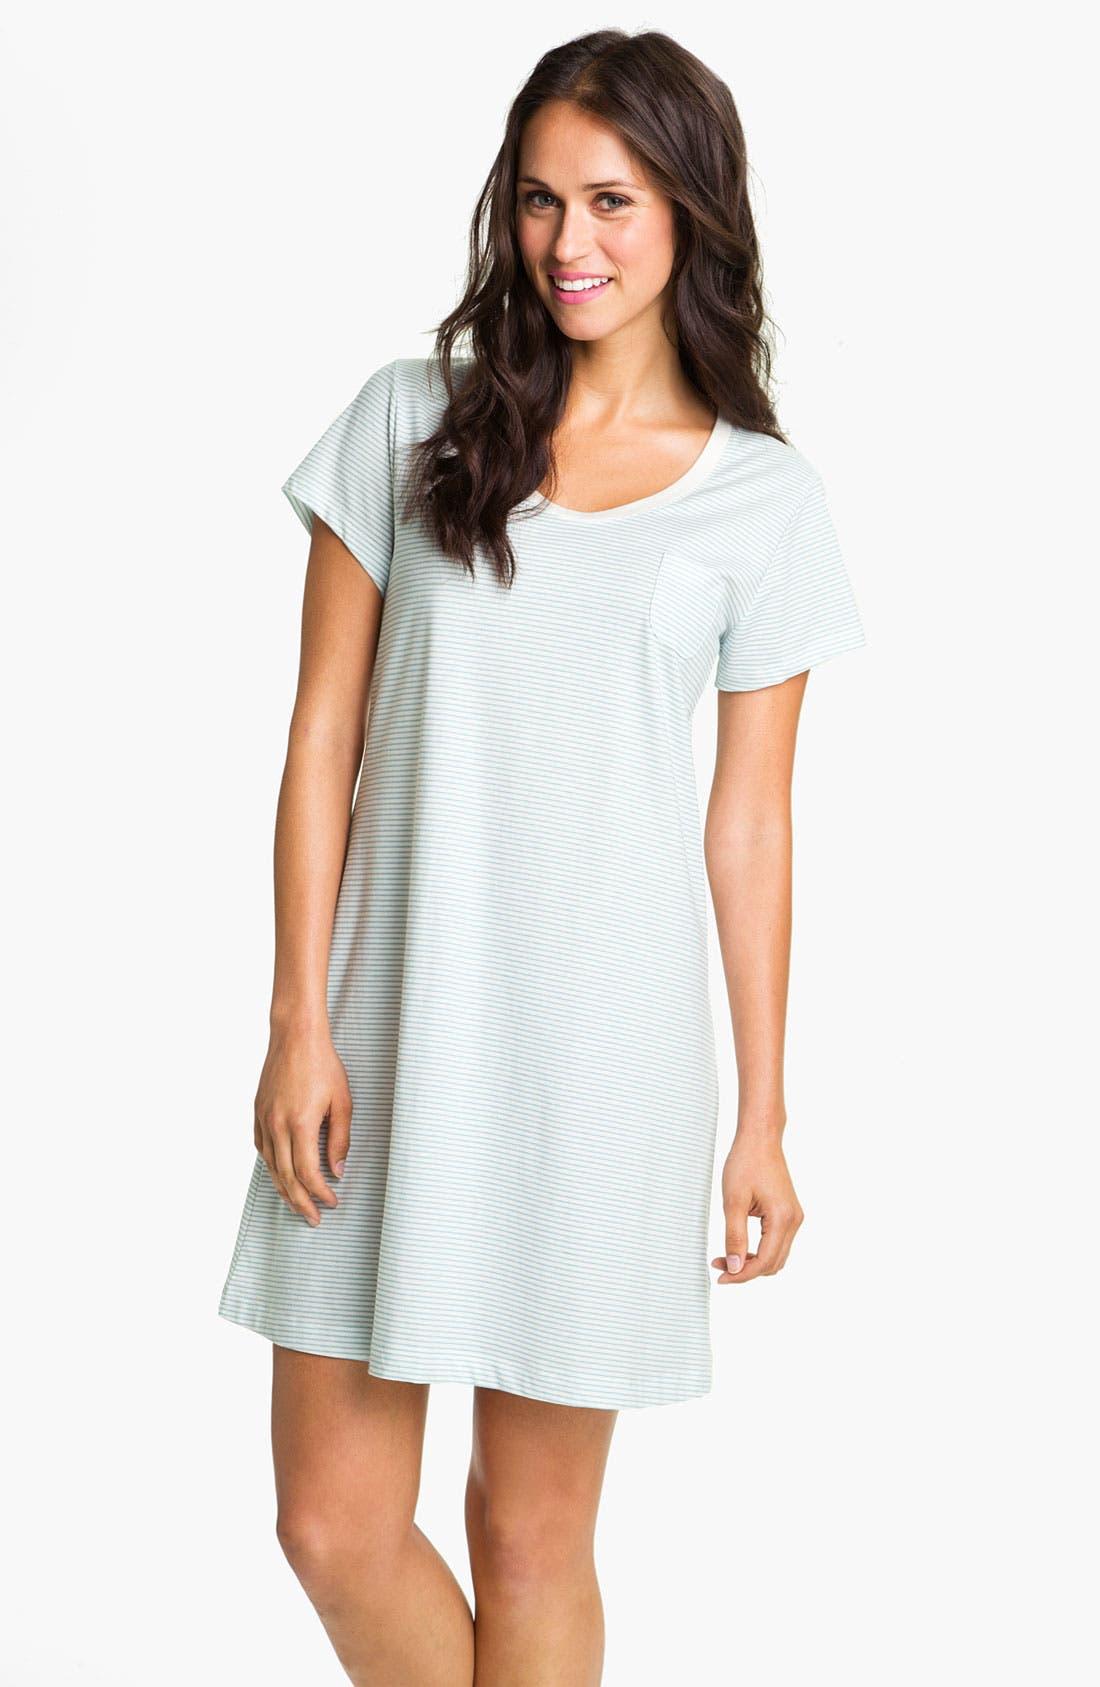 Main Image - Carole Hochman Designs Short Sleeve Sleep Shirt